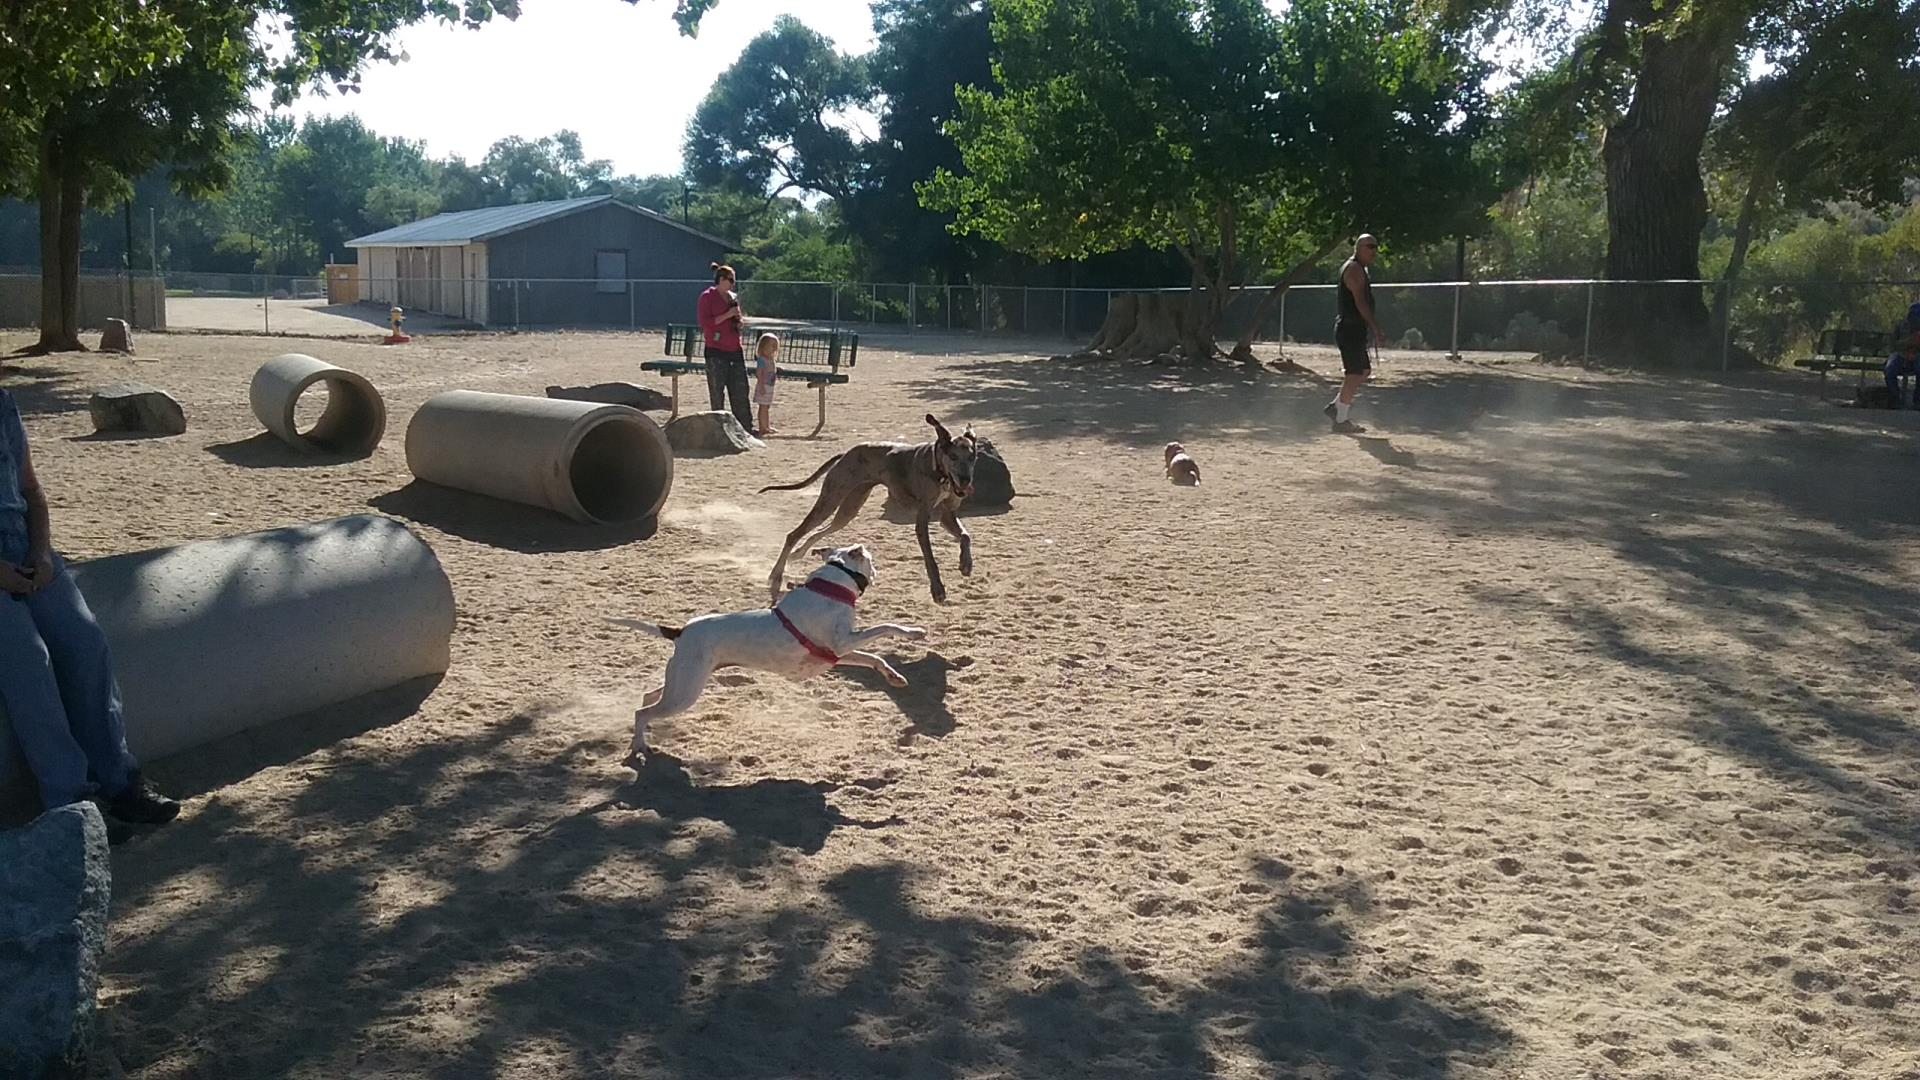 Dog Park Picture #1